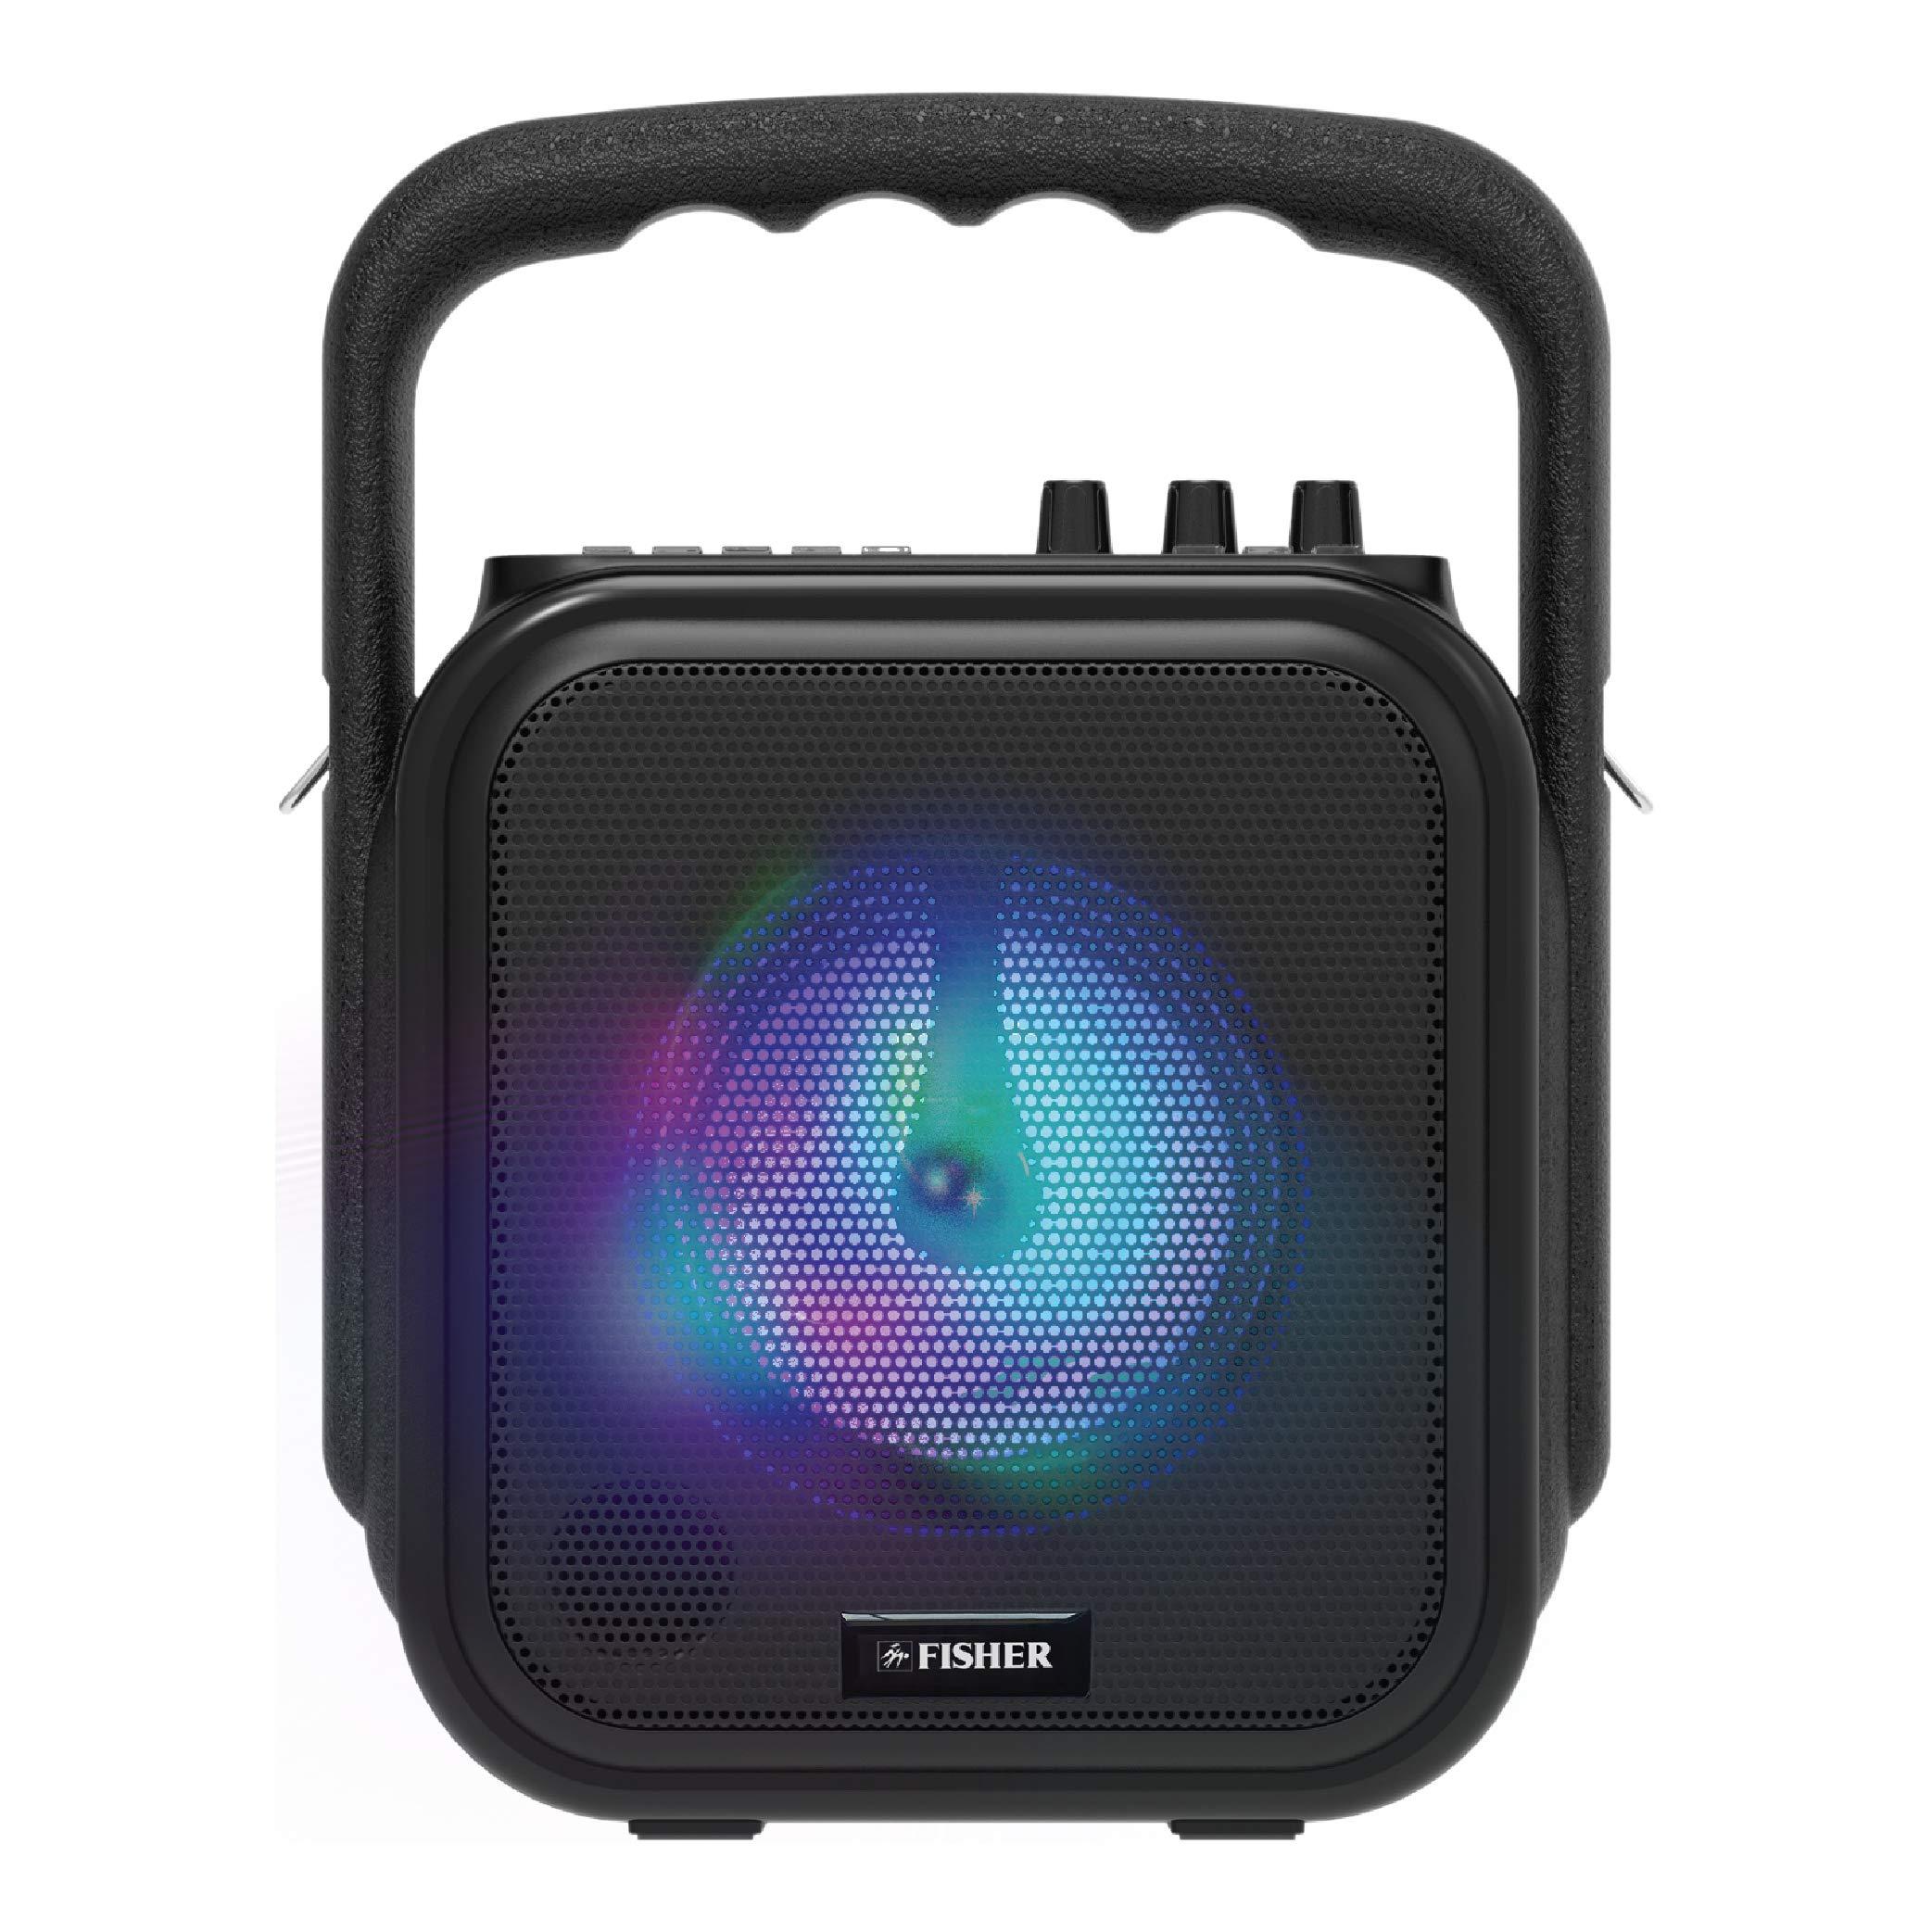 Fisher FBX360 Bluetooth Karaoke Speaker System with Remote Control (Black)